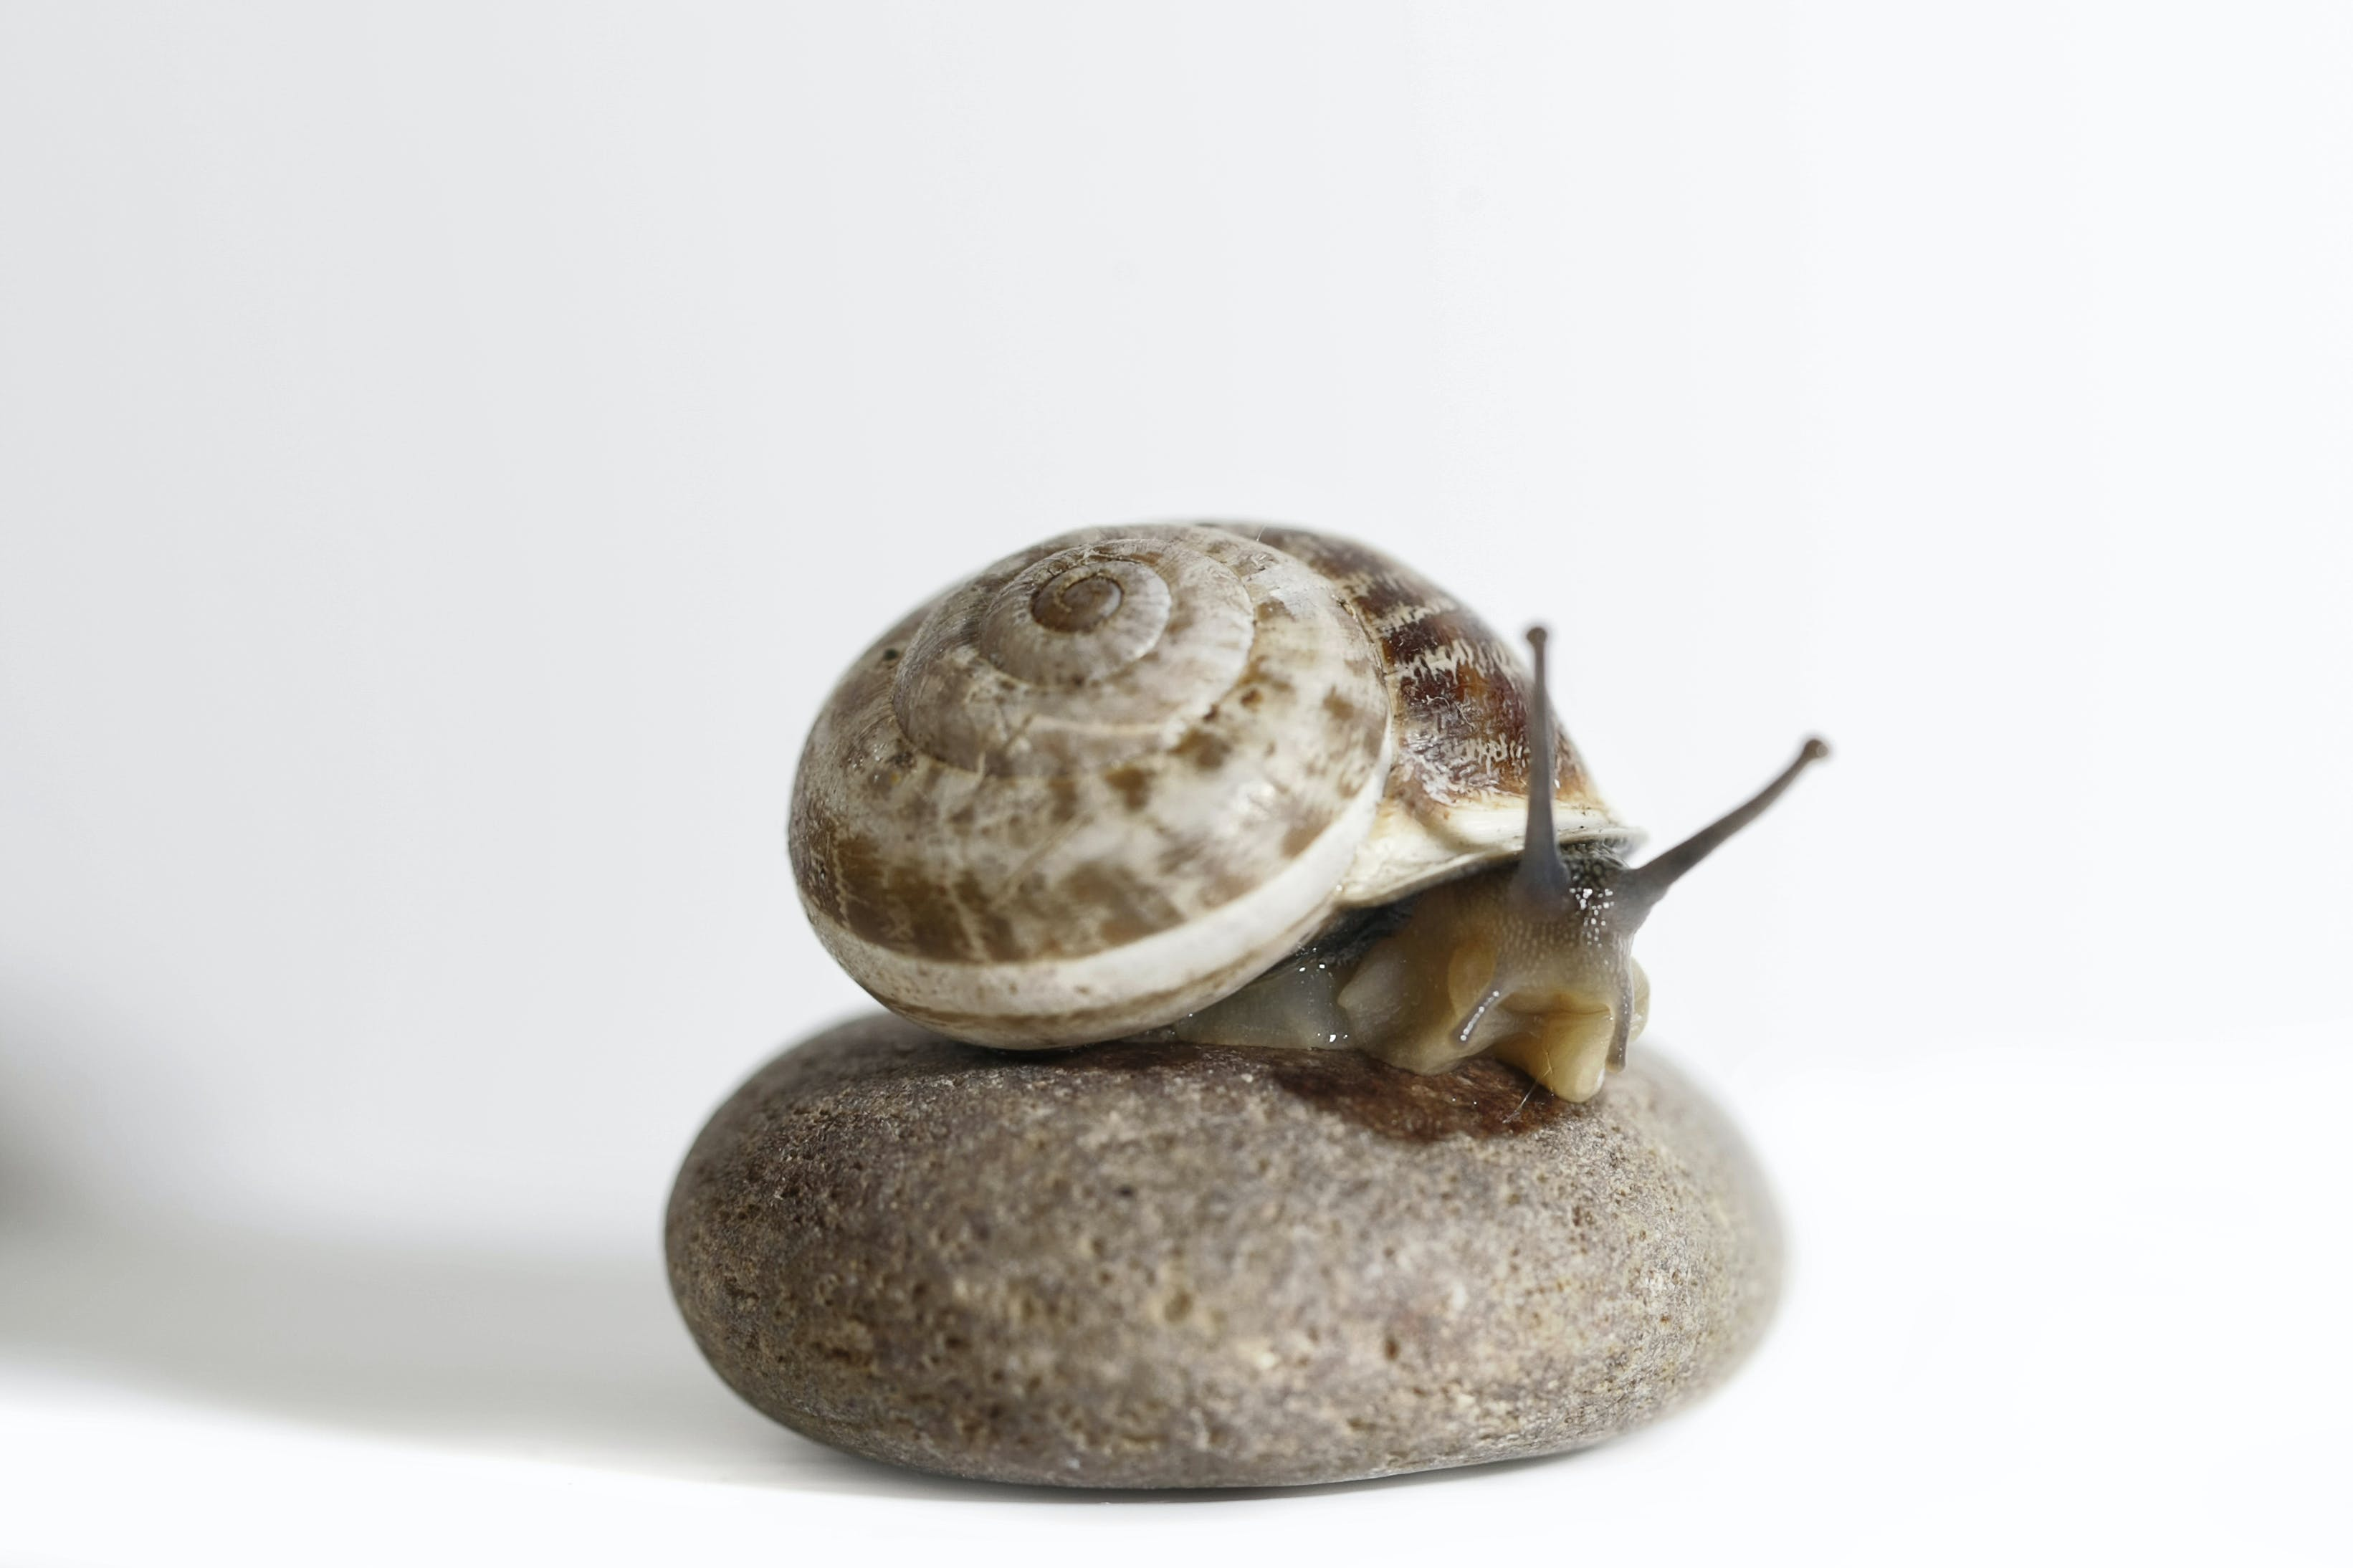 Brow Snail on Stone